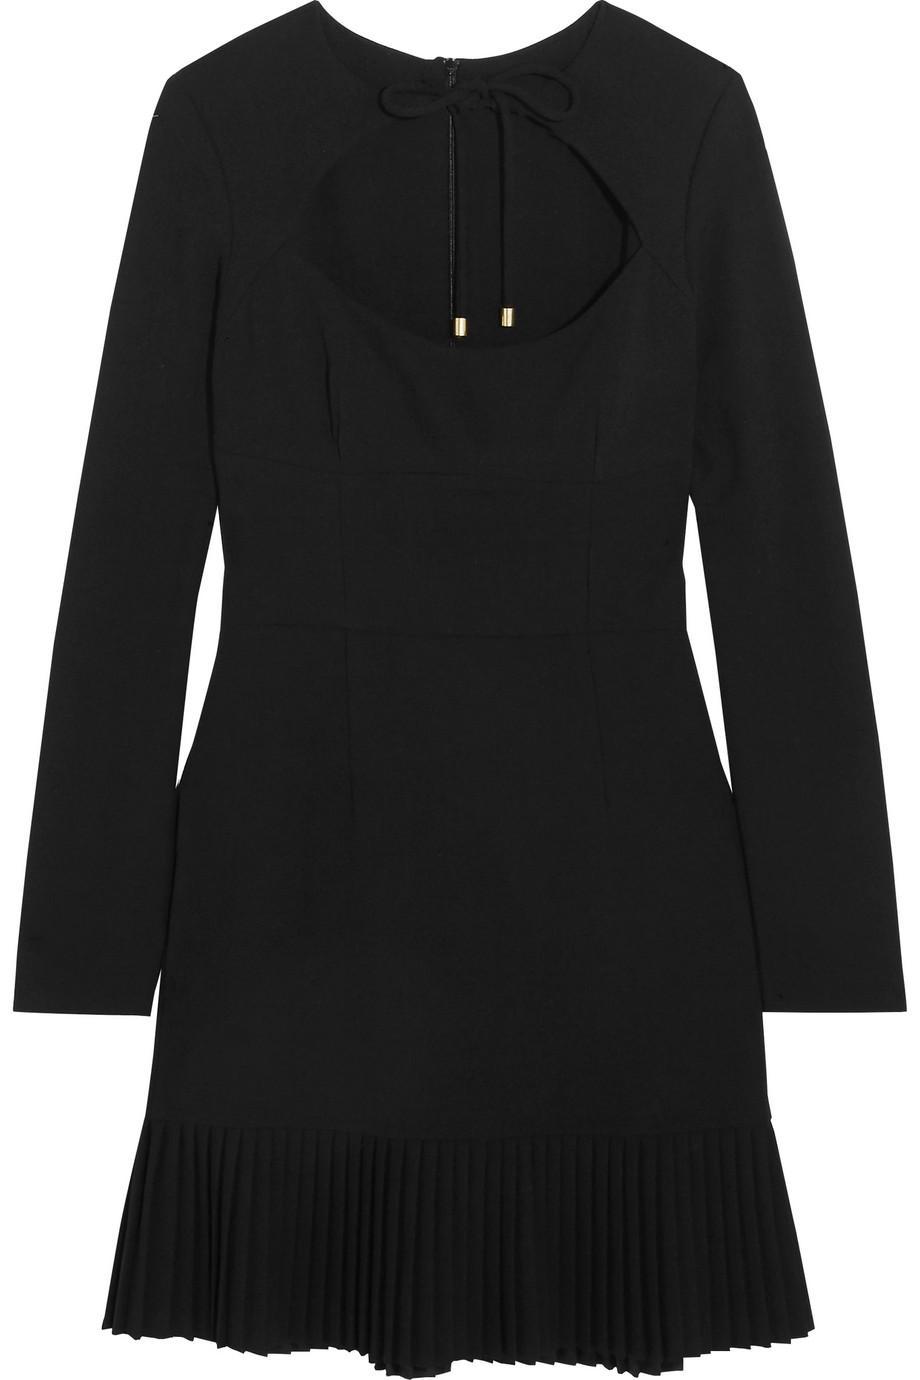 Beltrán Pleated Cutout Crepe Mini Dress - Black Rebecca Vallance Discount Perfect NgrZ4M9l4